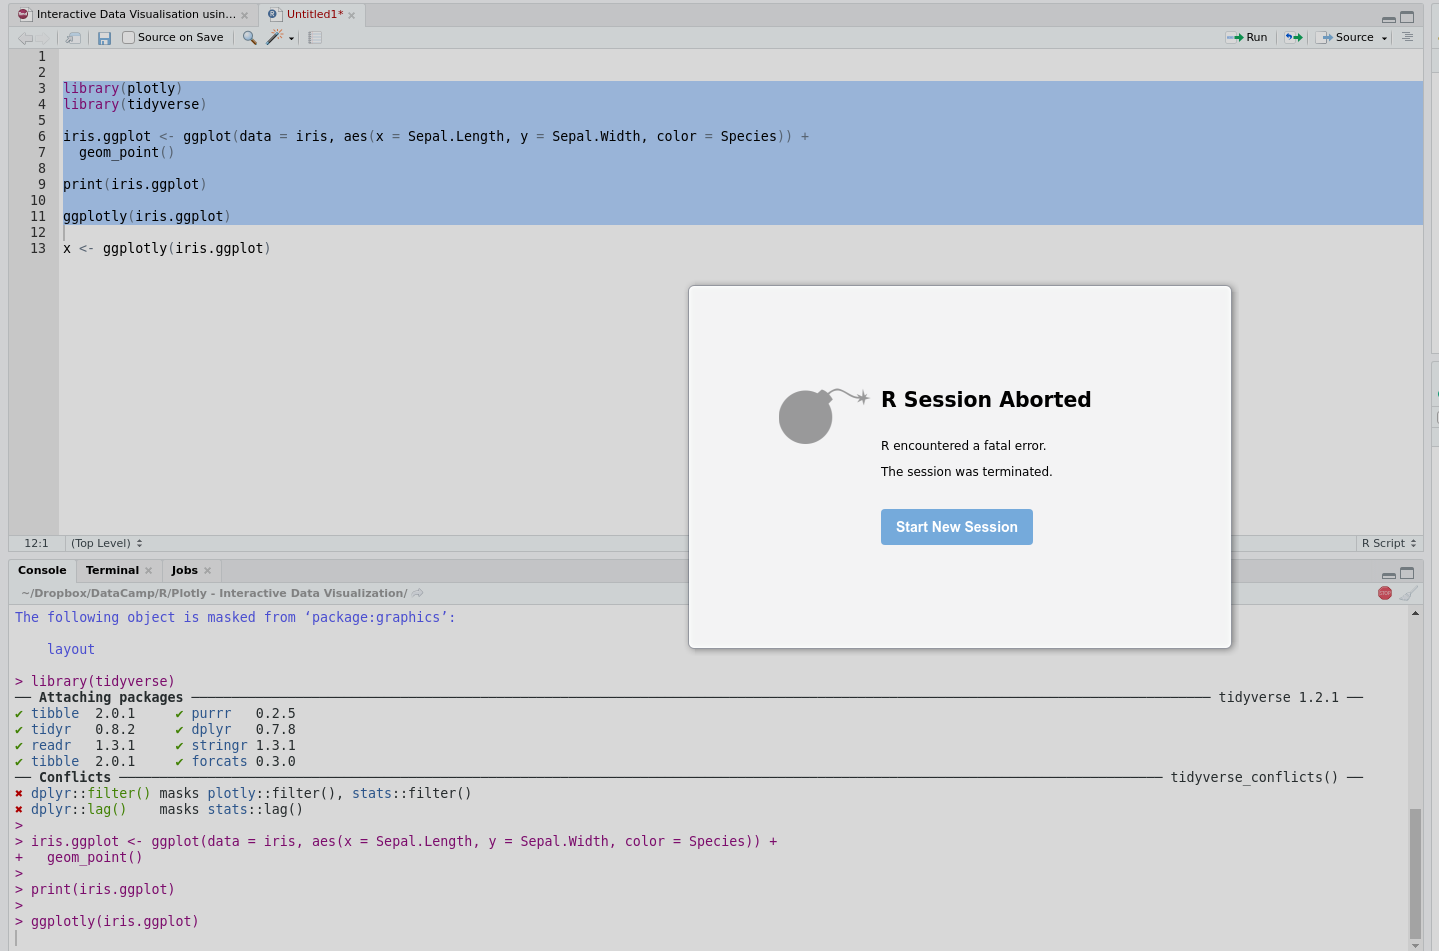 ggplotly function on ggplot2 object crashes R & RStudio